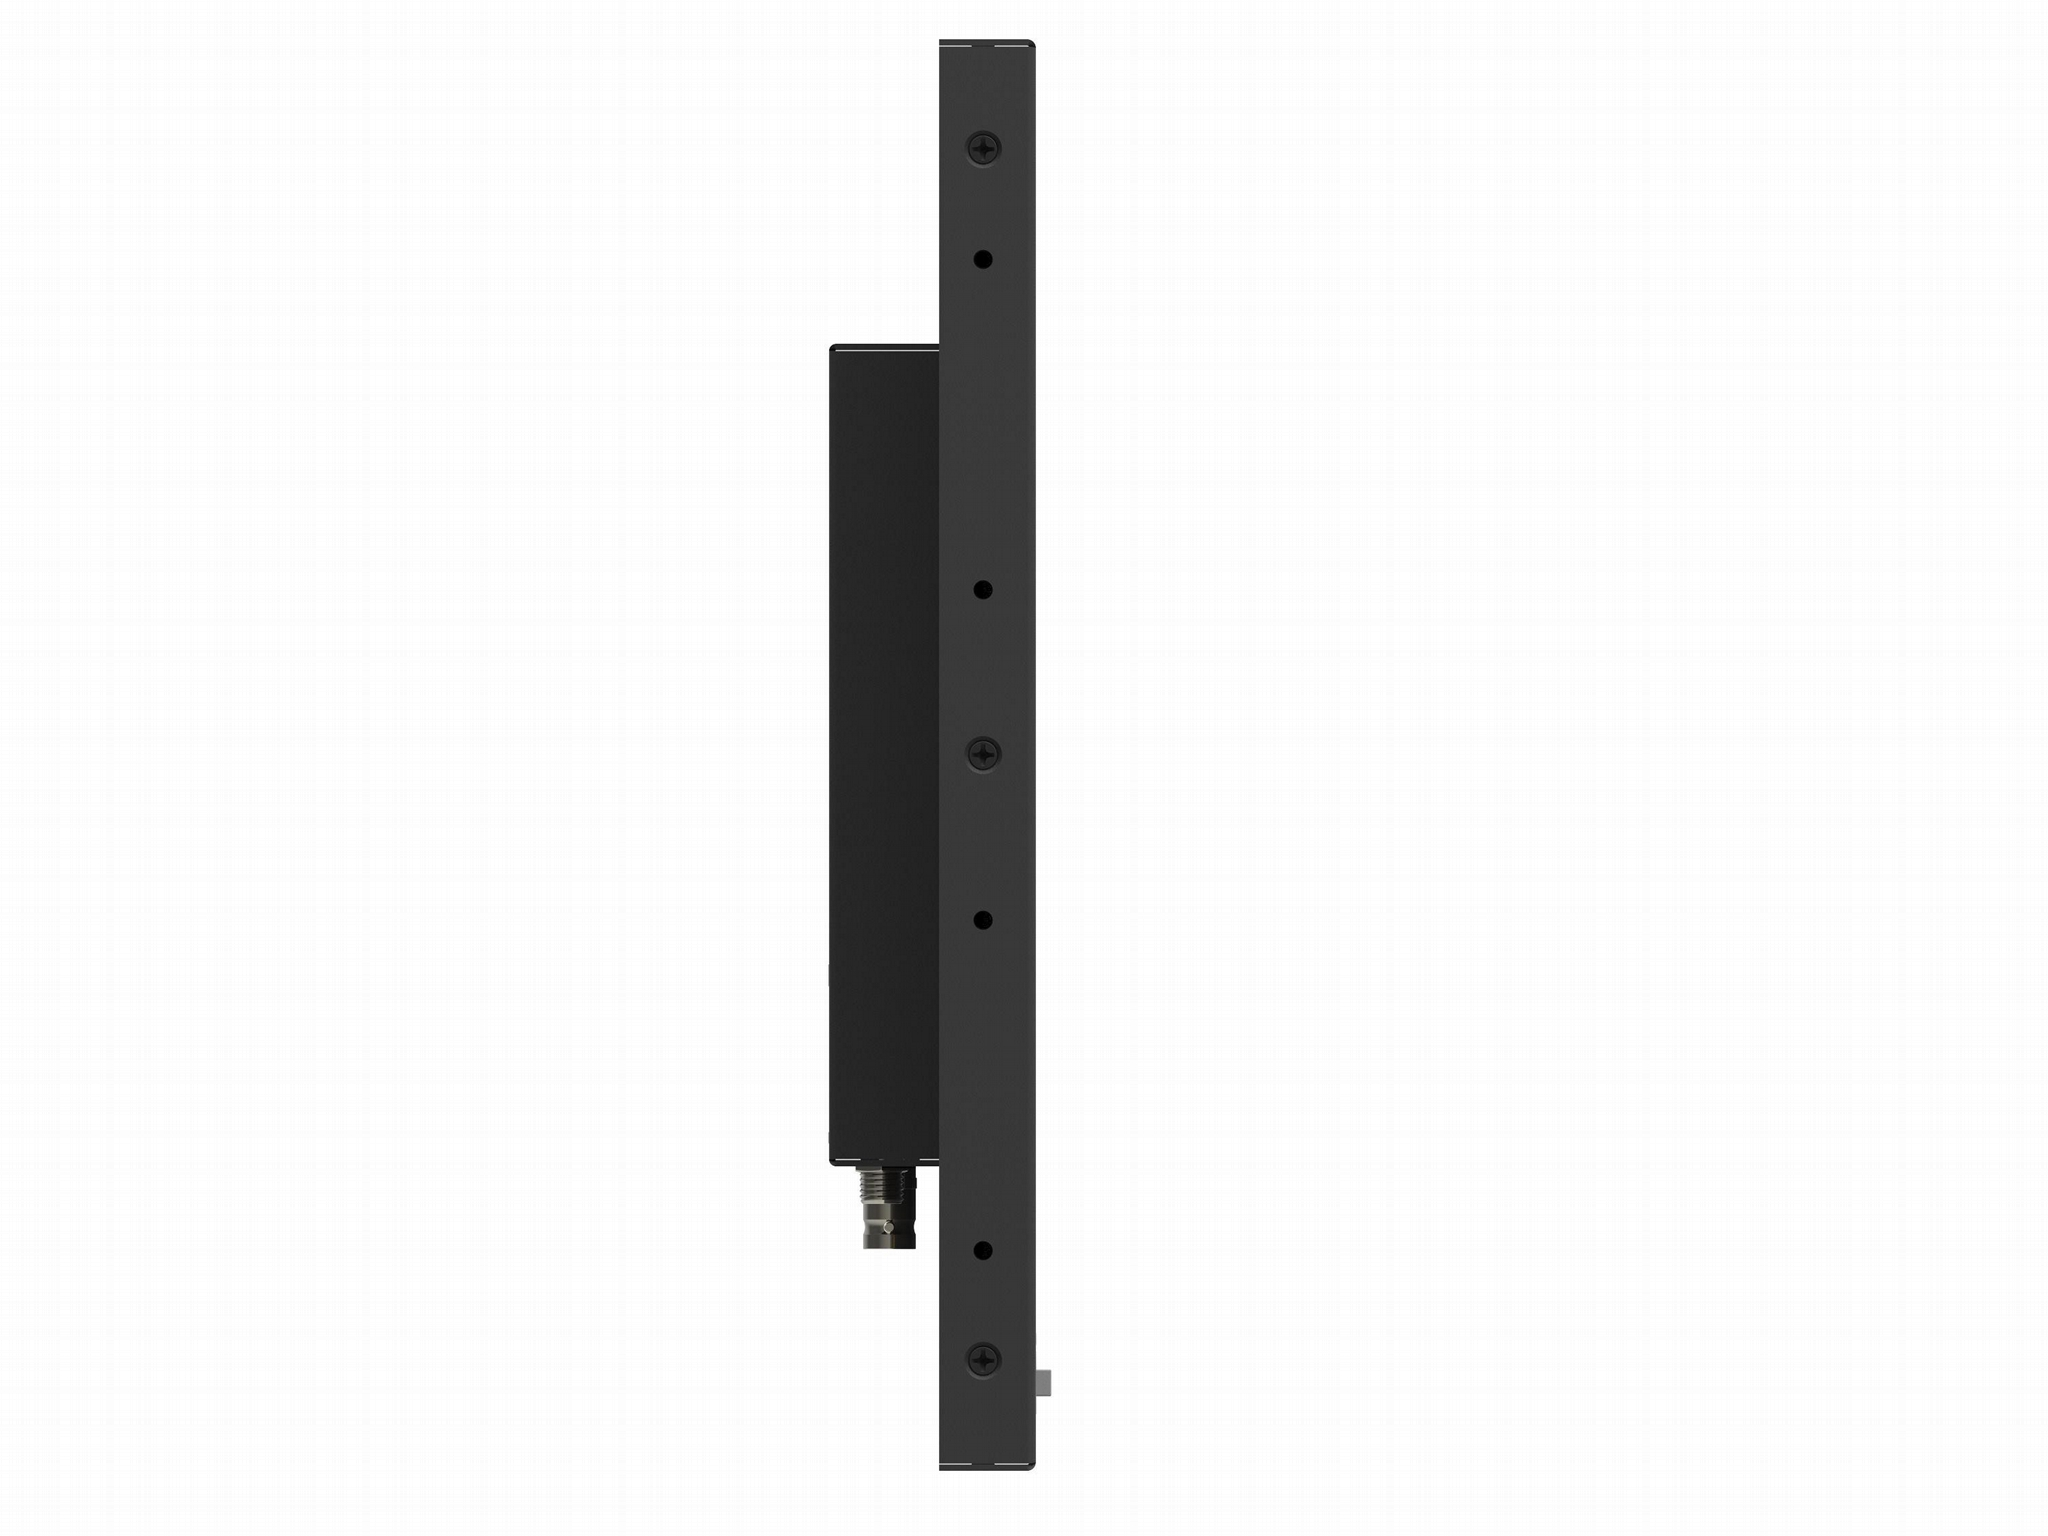 LILLIPUT 15.6 inch 1920*1080 security camera cctv monitor with 3G-SDI, HDMI, VGA 2